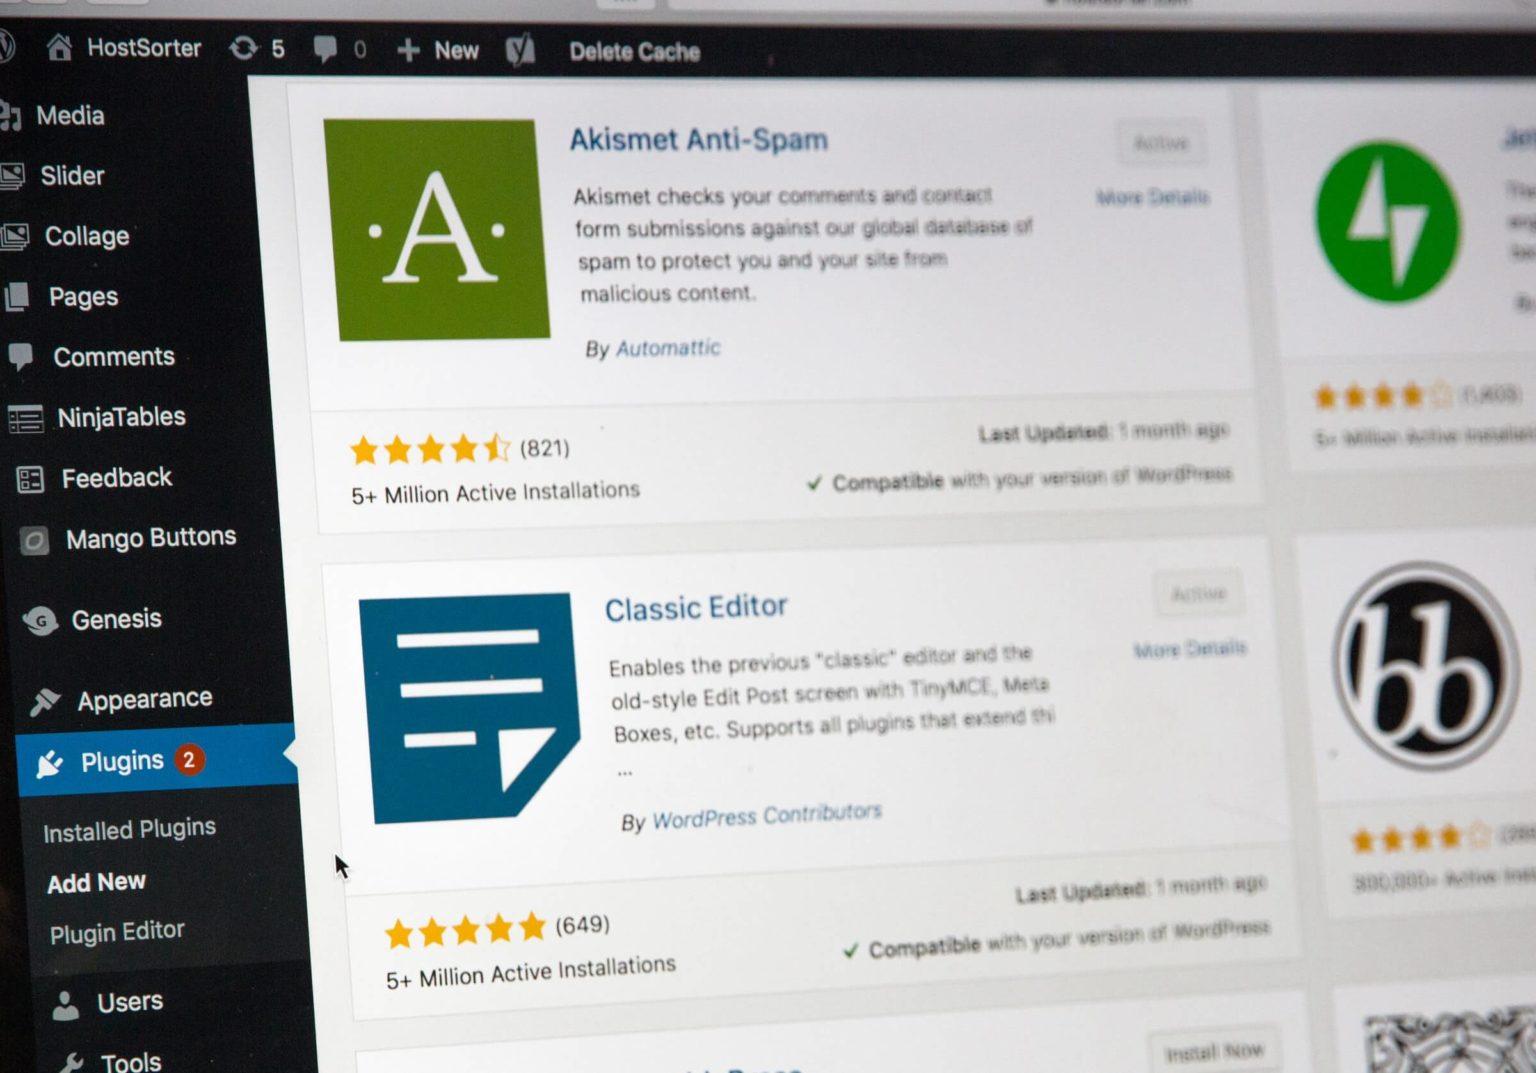 wordpress plugins admin area askimet classic editor